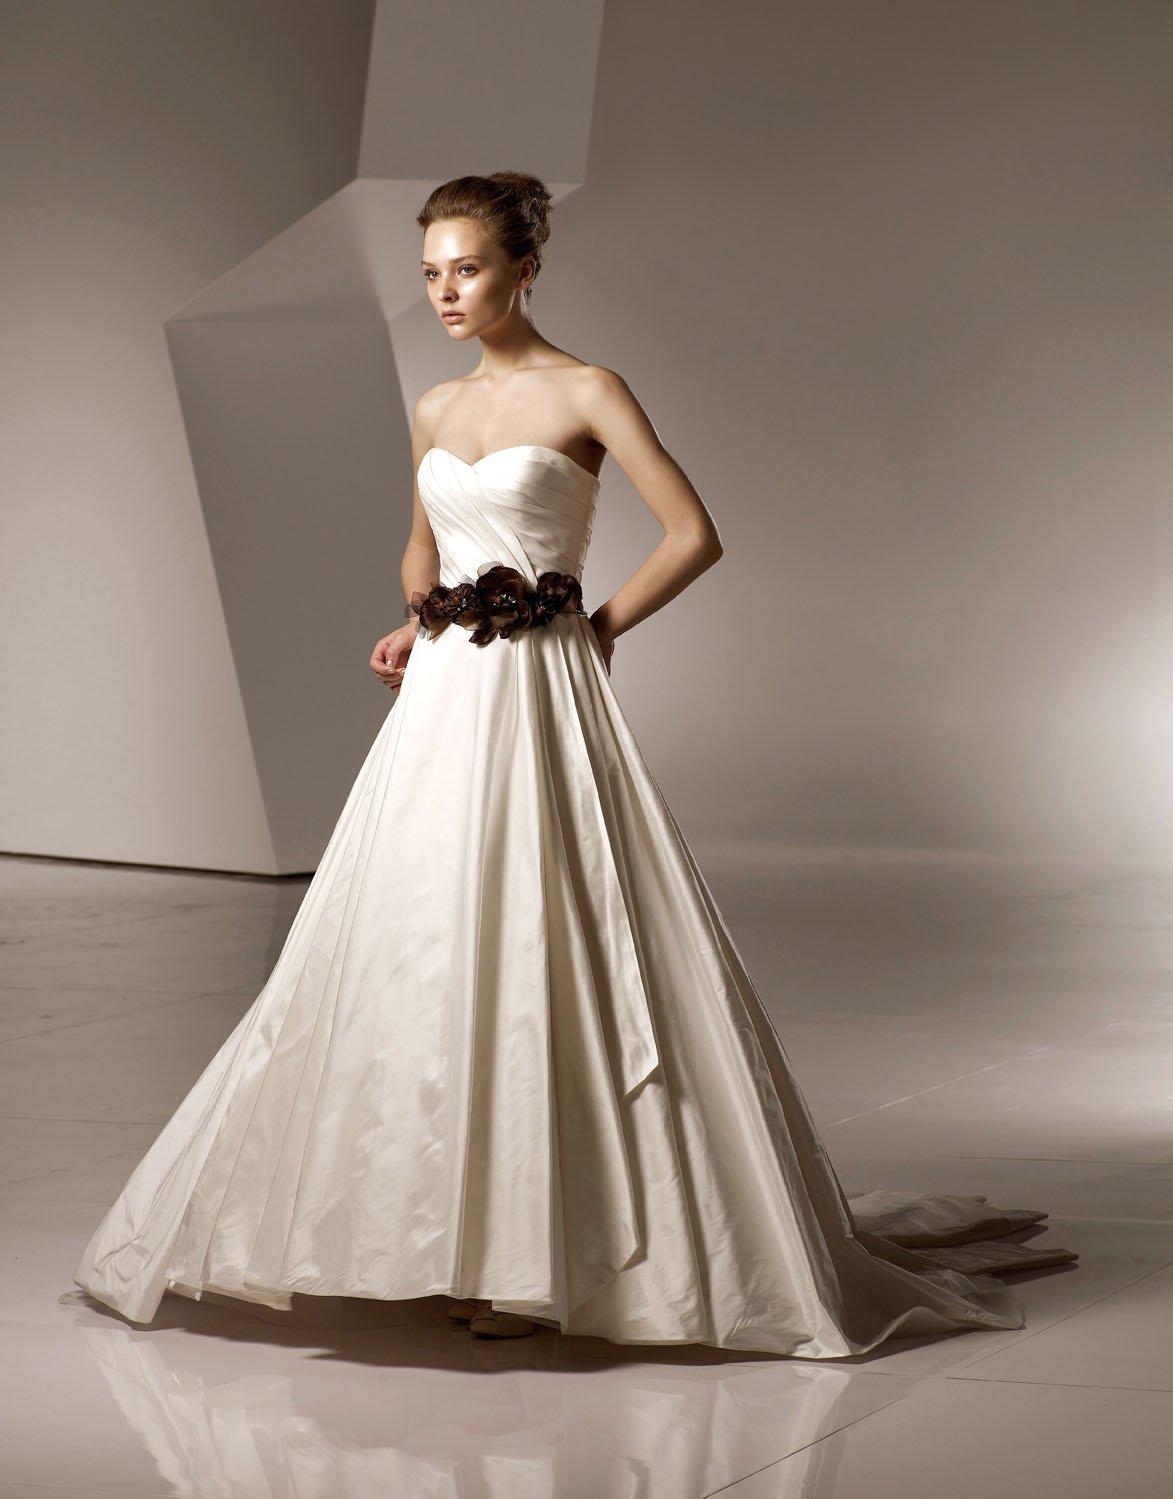 Sweetheart Neckline Strapless Train Taffeta Wedding Dress Bridal Gown